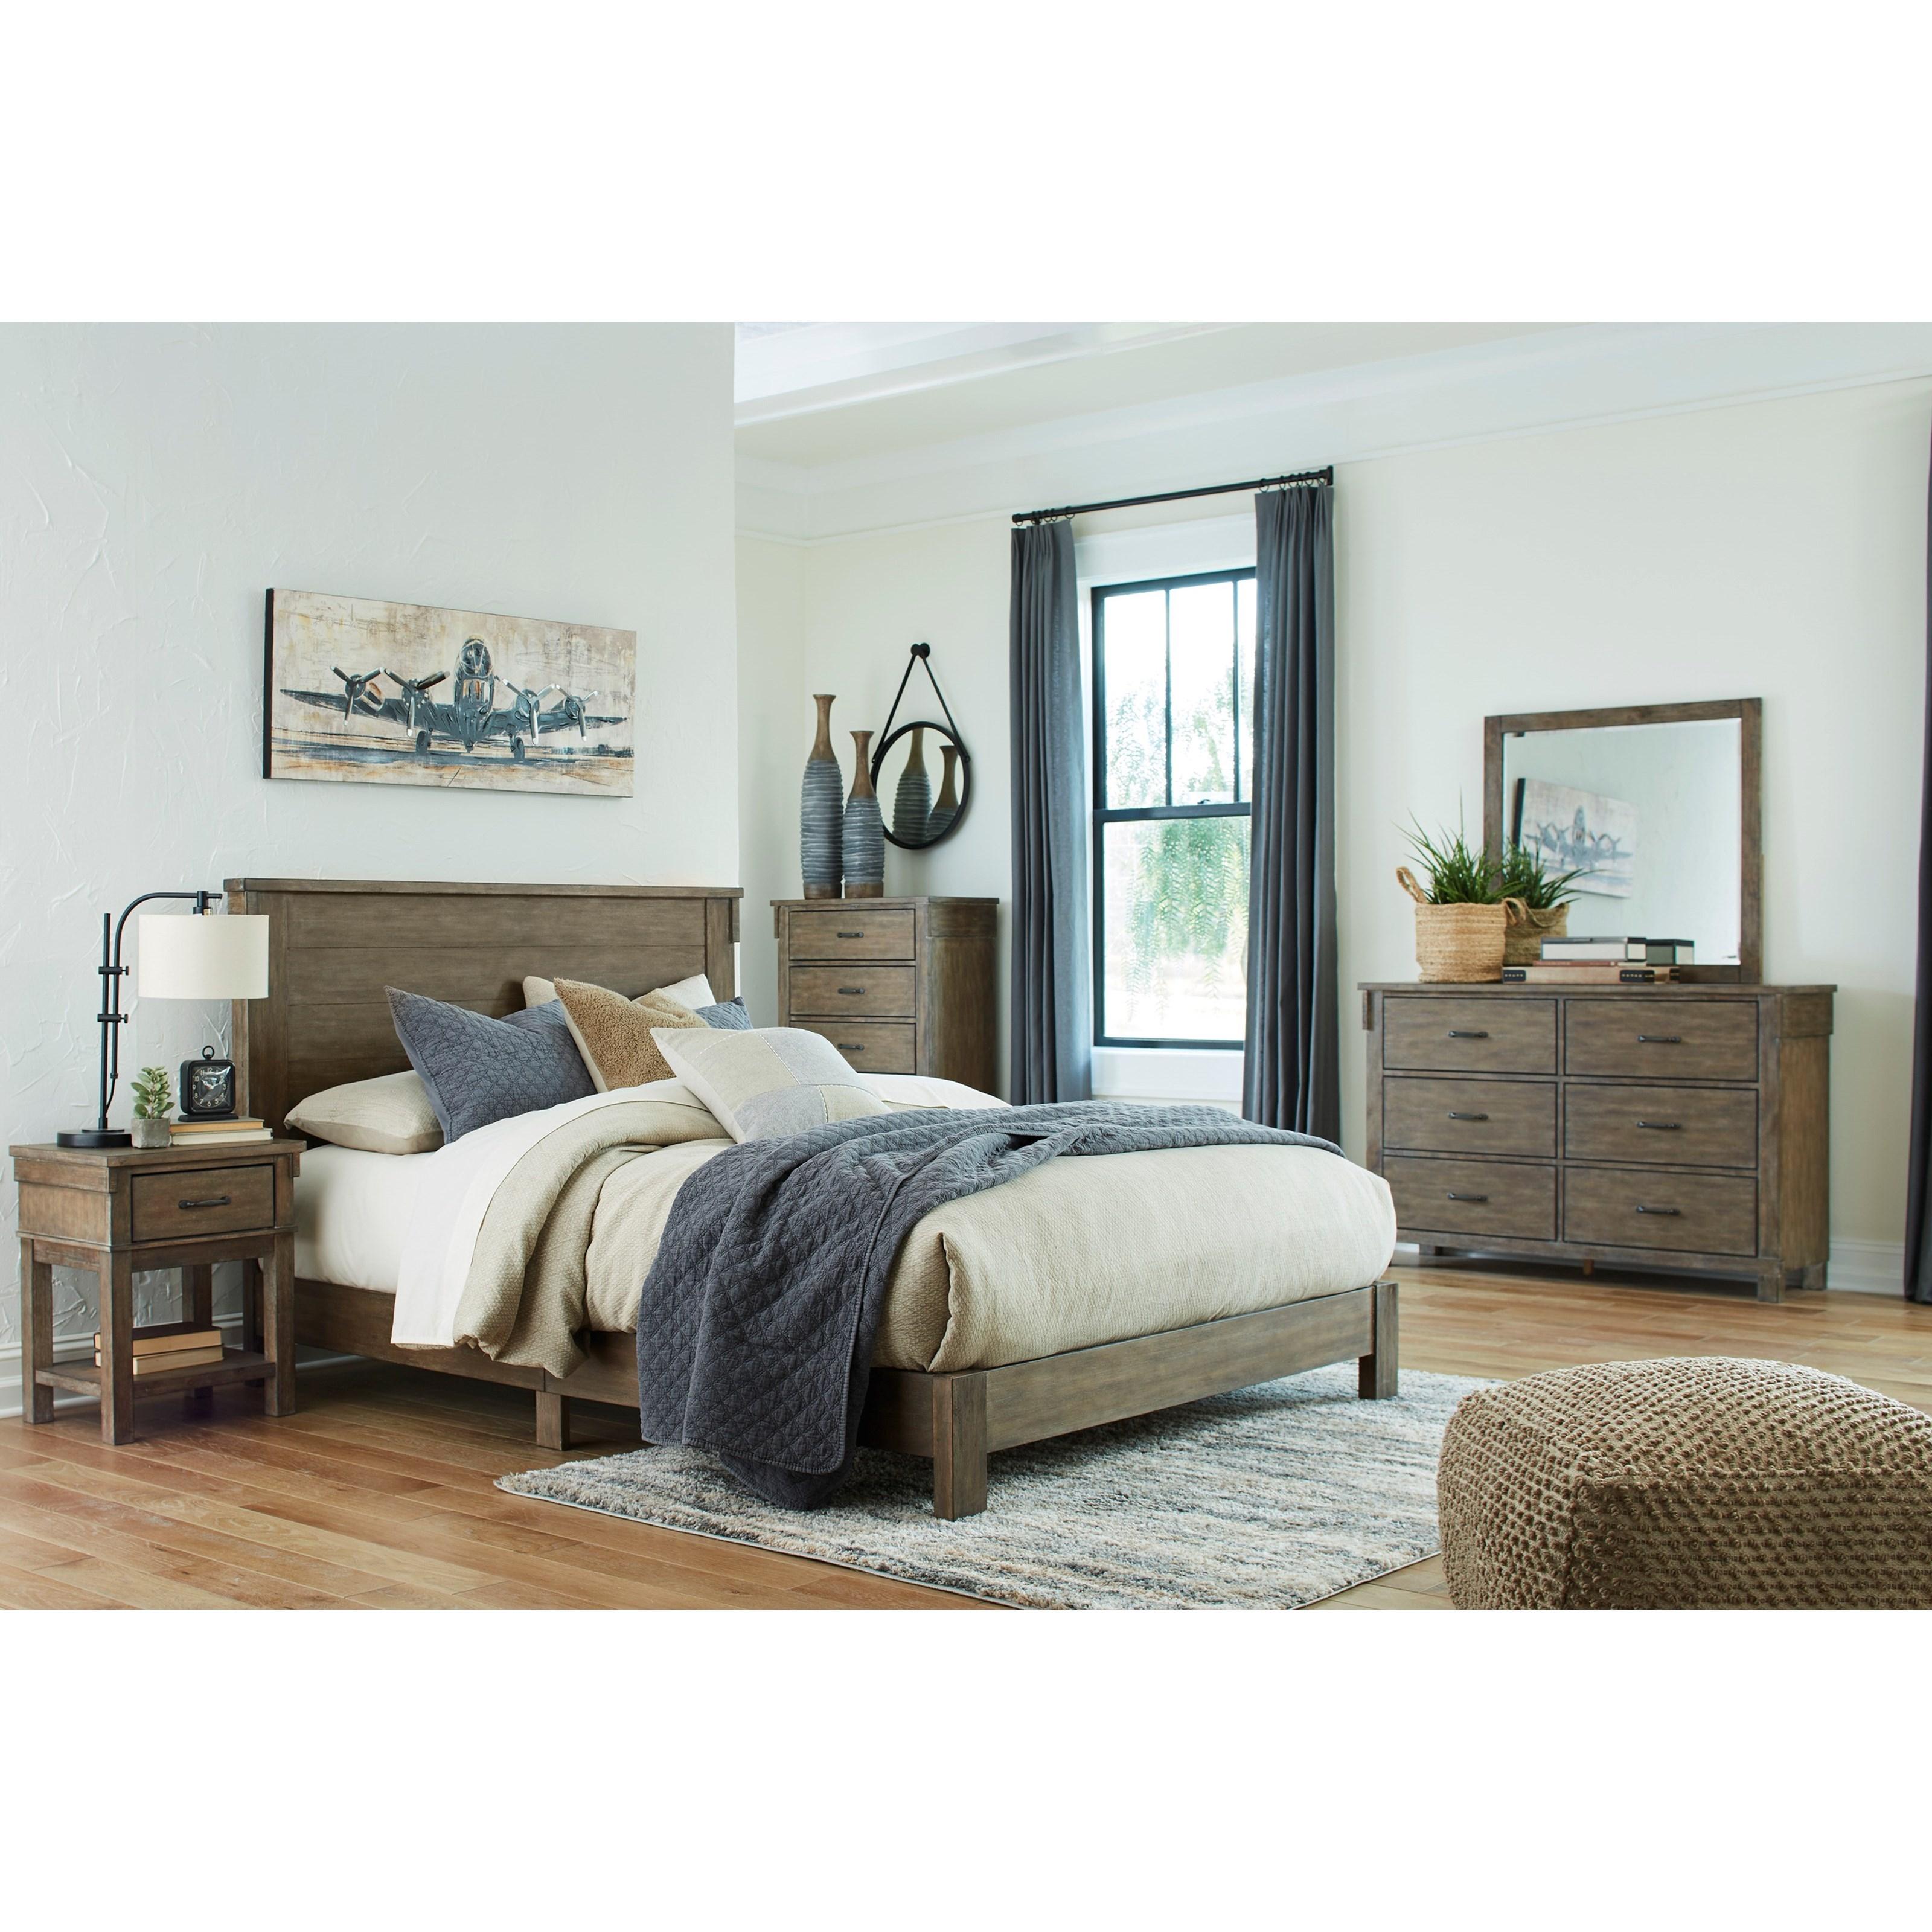 Shamryn King Bedroom Group by Signature at Walker's Furniture